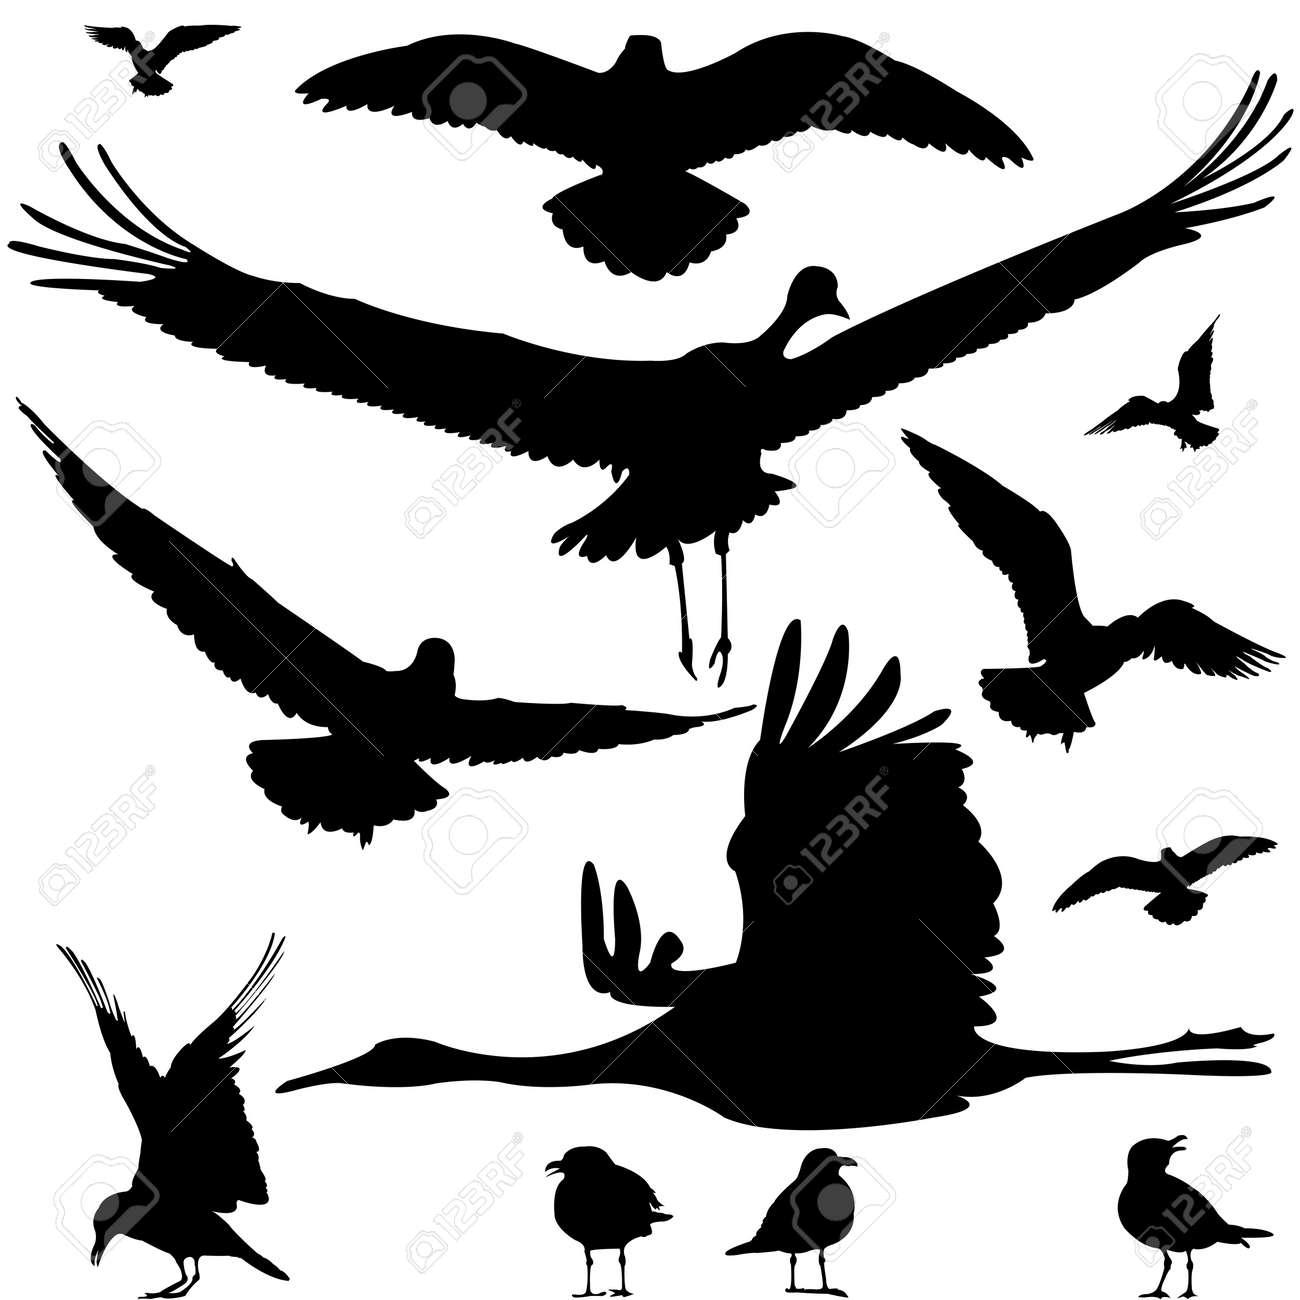 birds silhouettes isolated on white, abstract art illustration Stock Illustration - 8544726